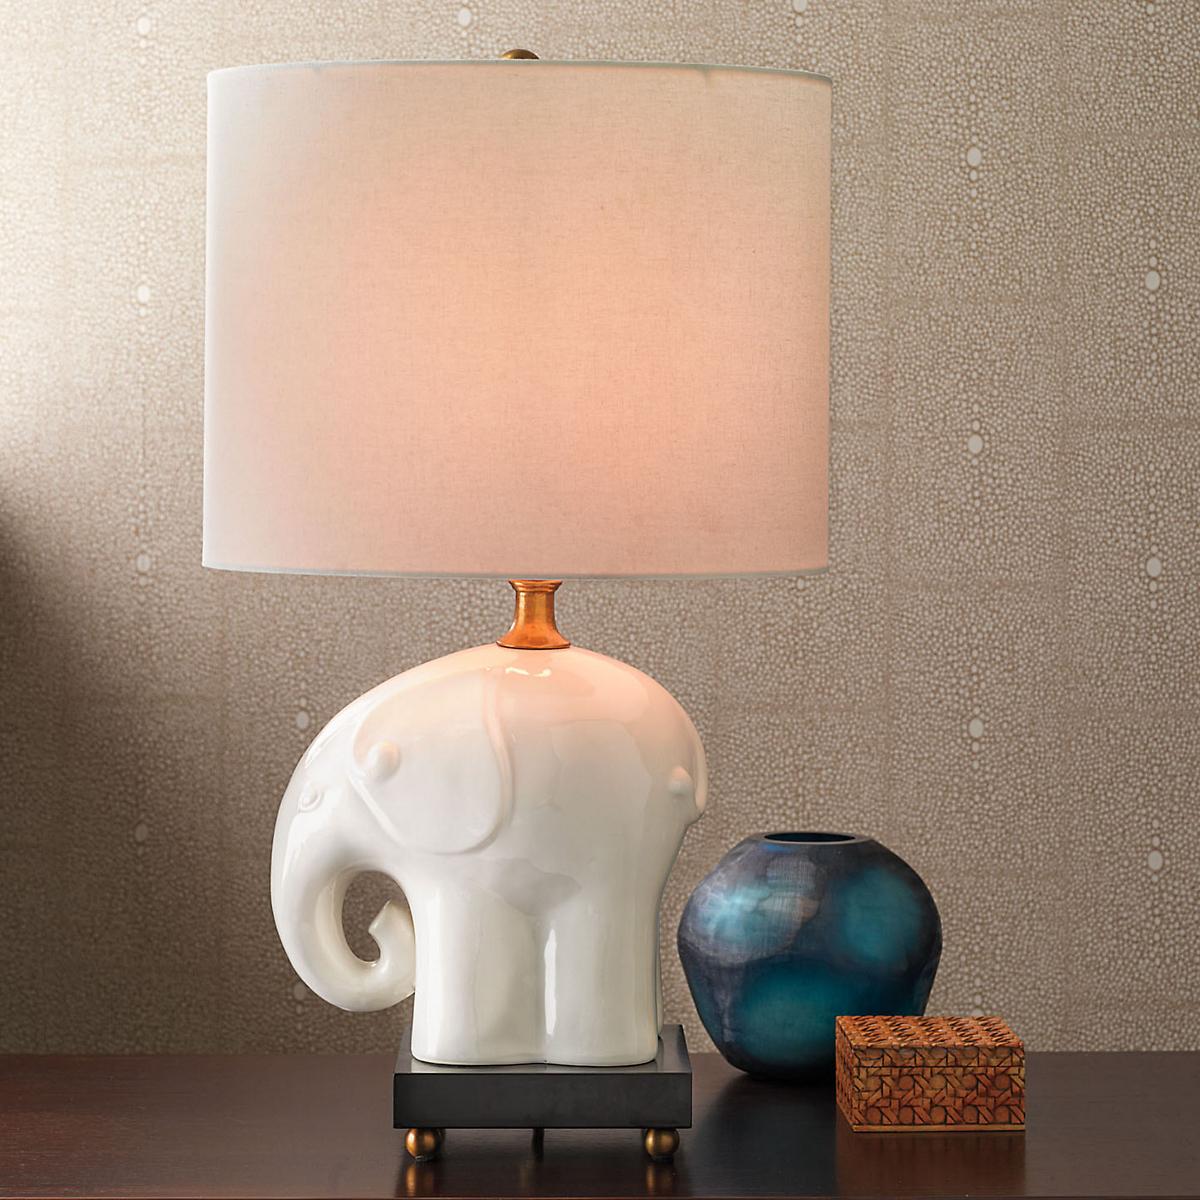 Charming Elephant Table Lamp